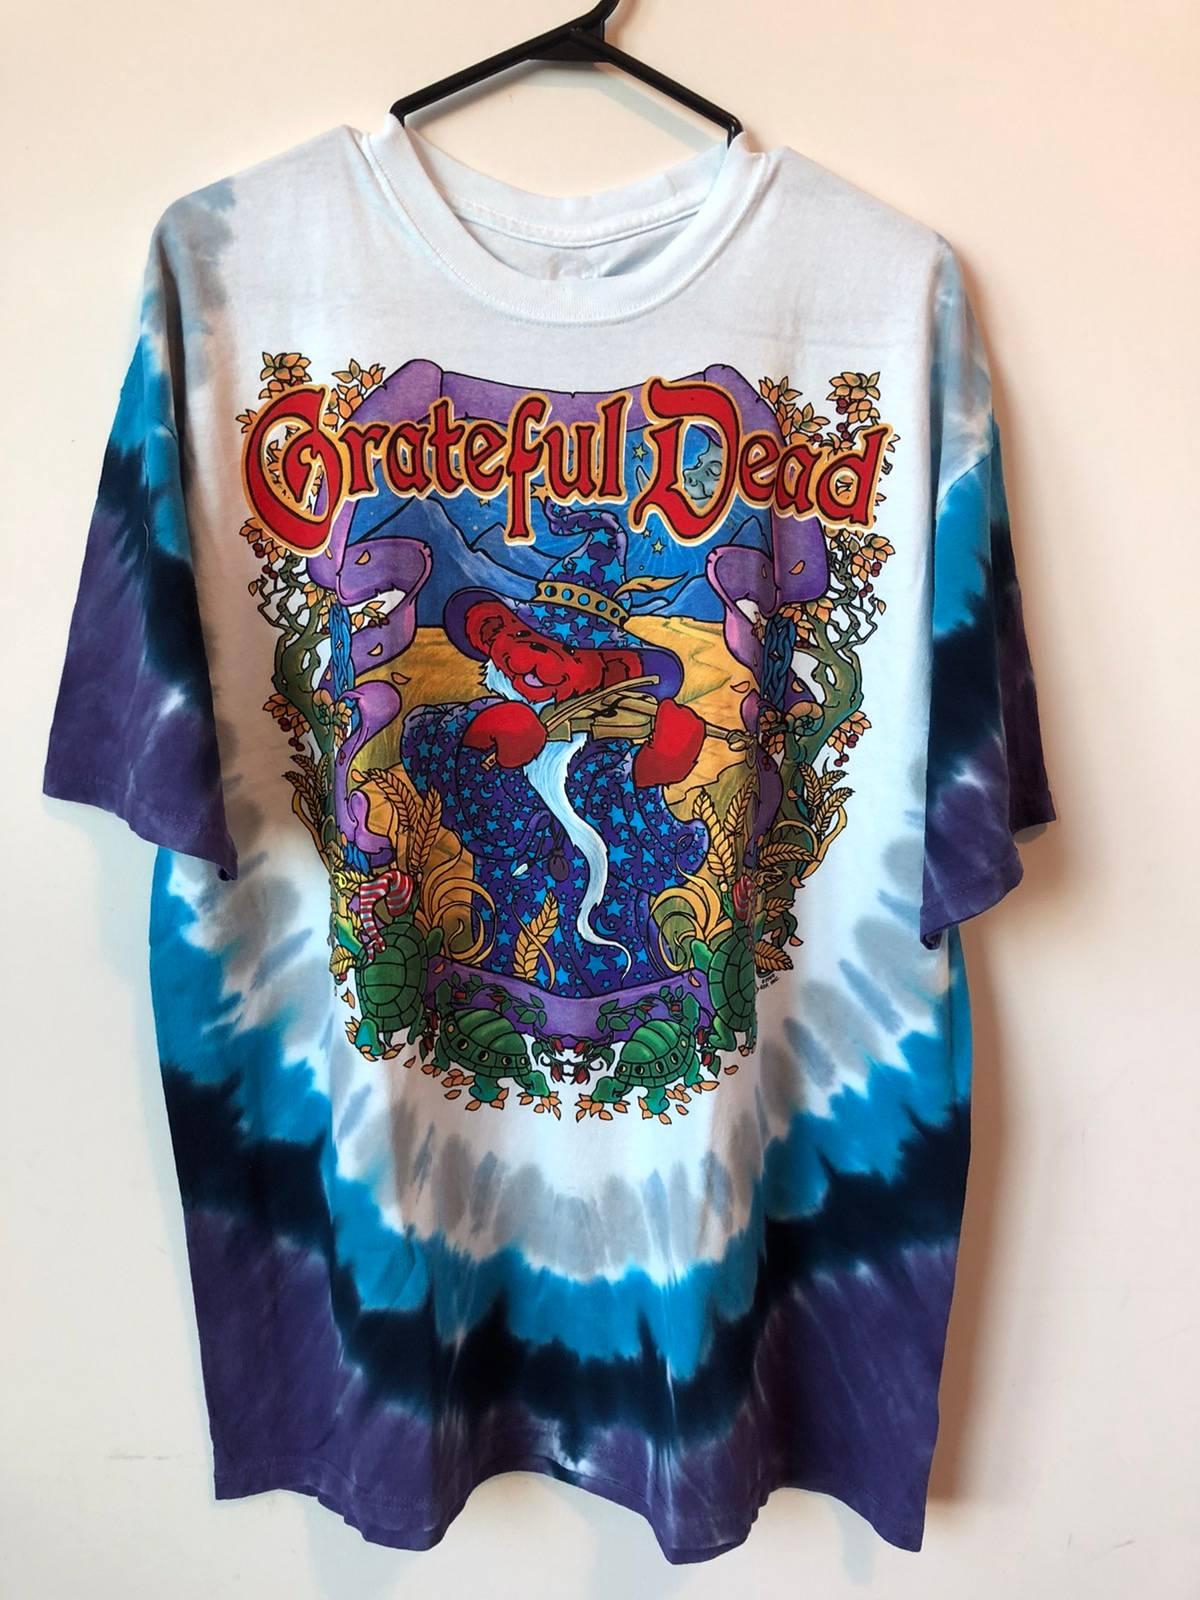 Grateful Dead Night Rider Guys Gals Unisex Next Level Grateful Dead 34 Sleeve Baseball Jersey by Not Fade Away from Grateful Tortuga